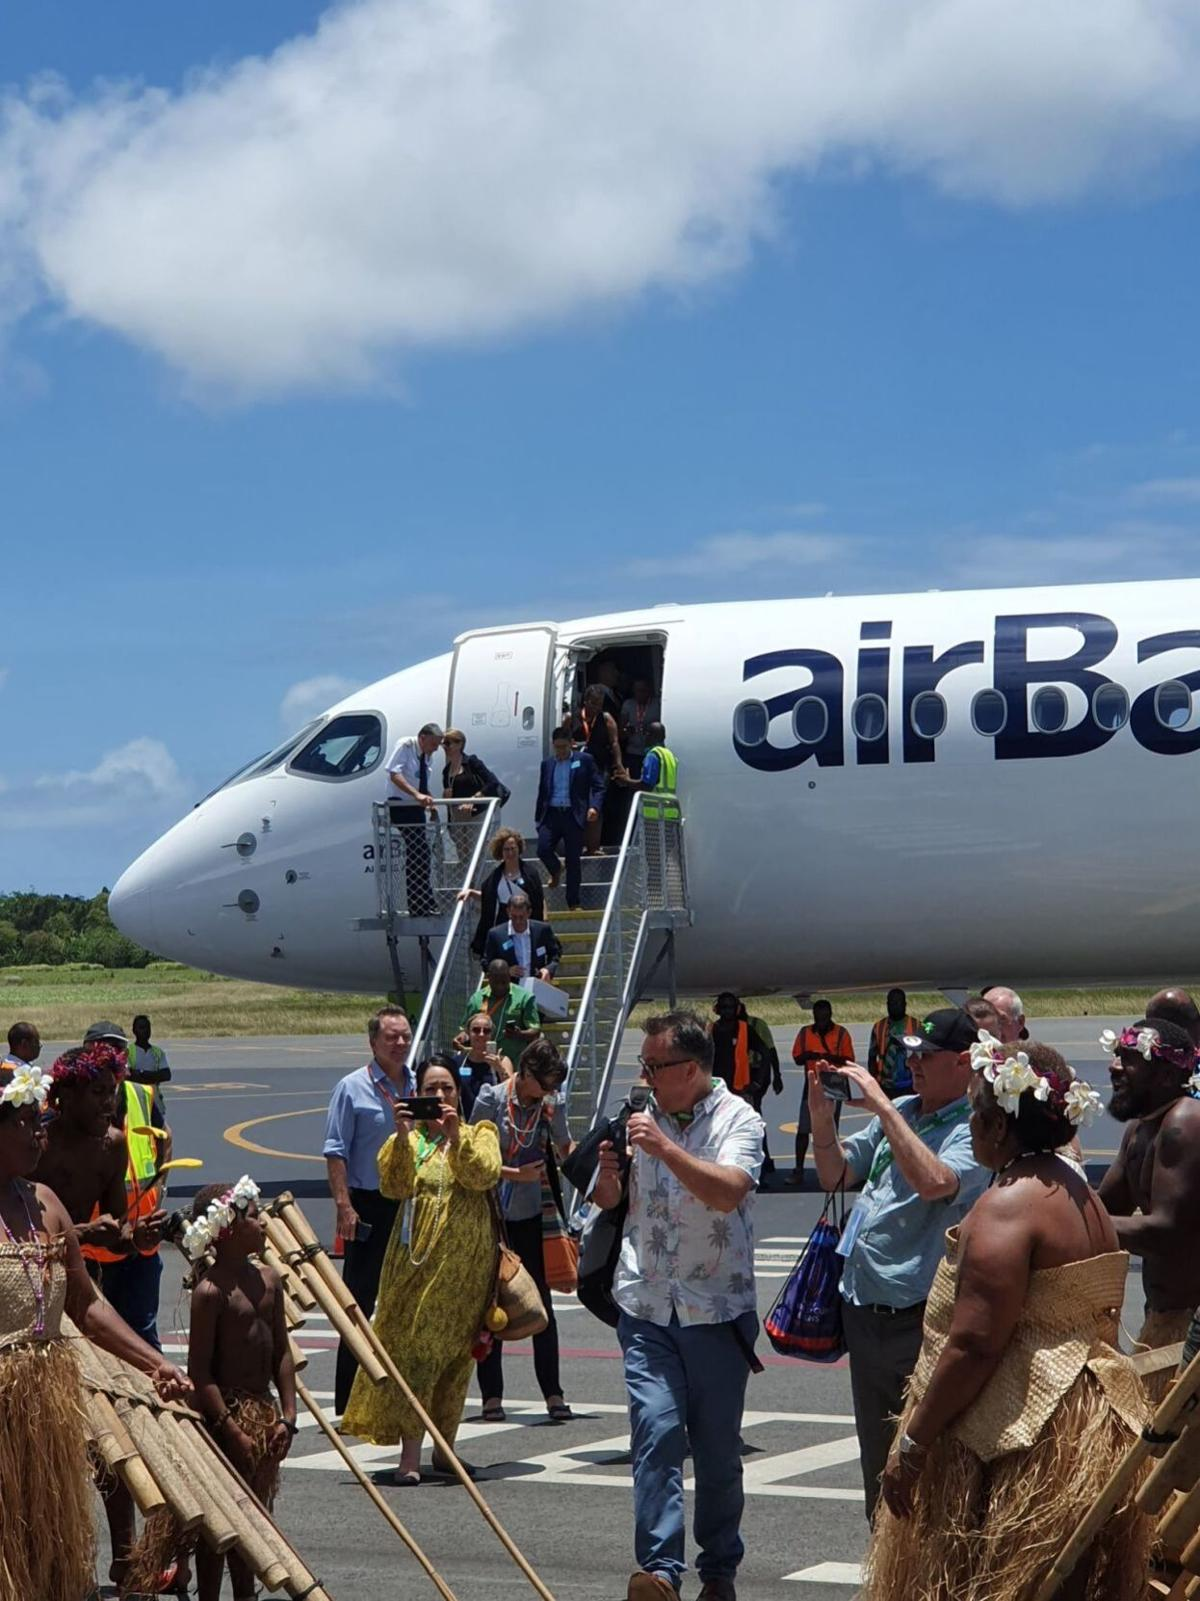 COI: AIRBUS NOT SUITABLE